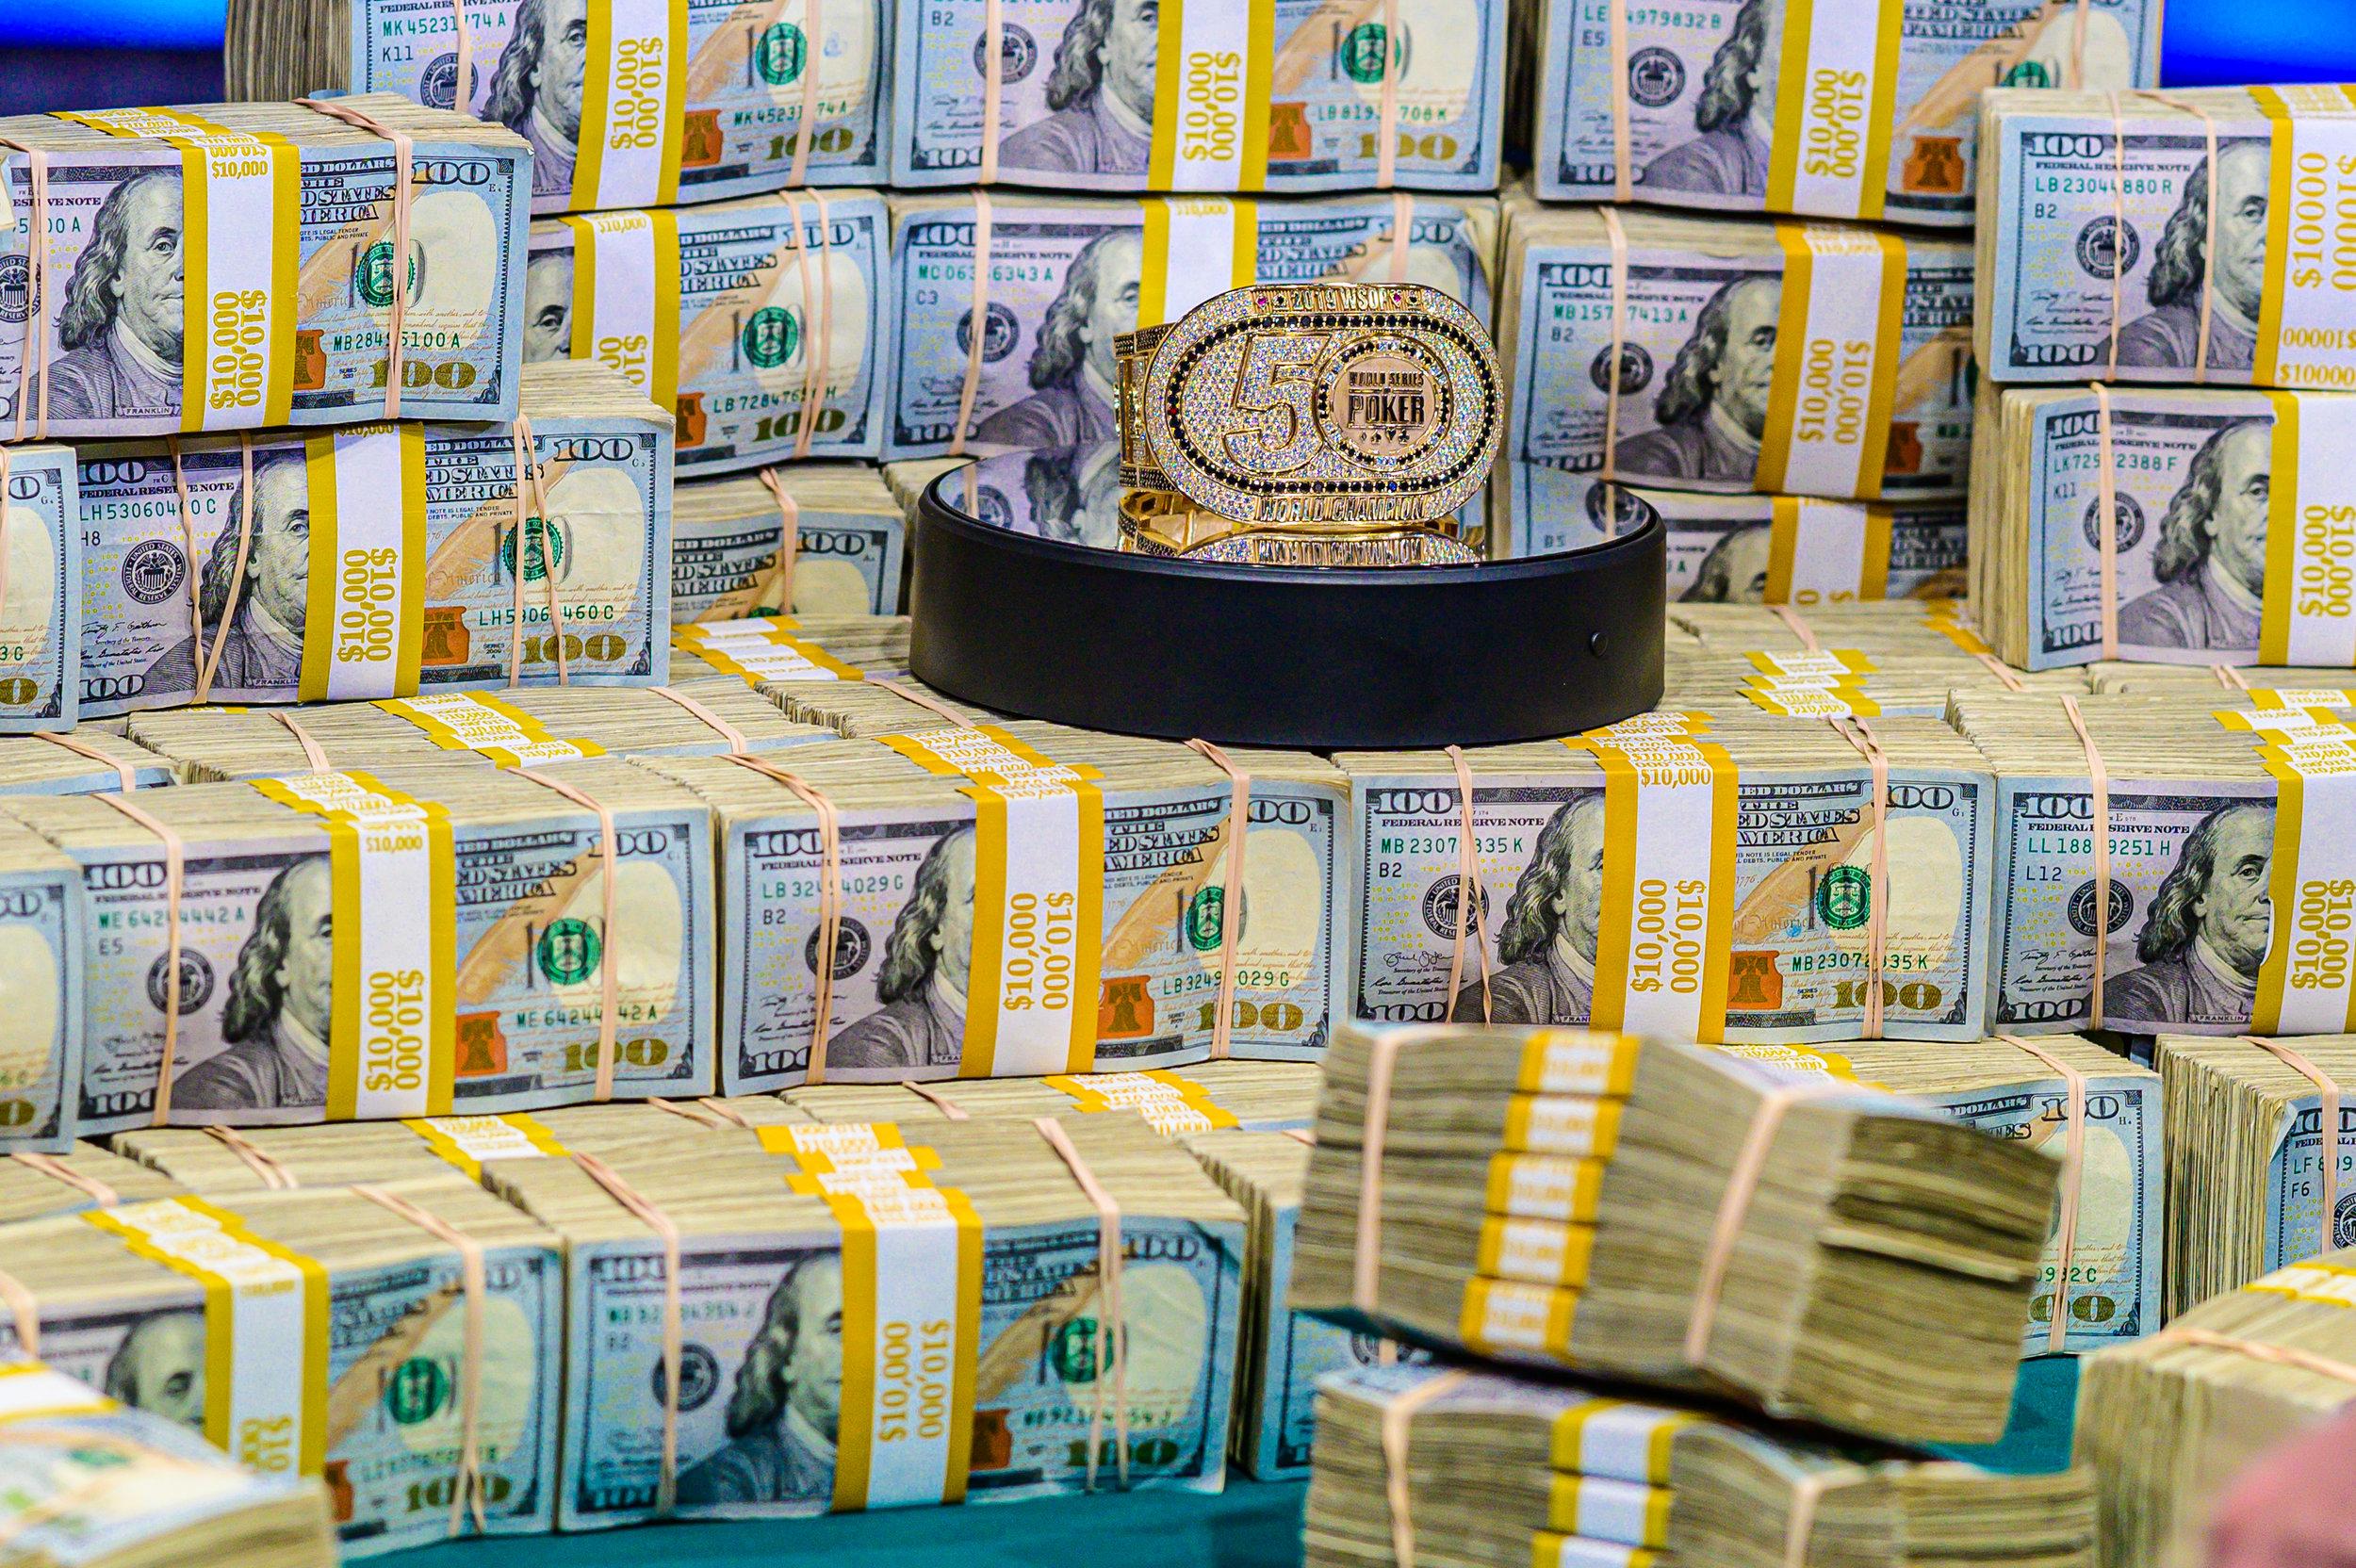 Bracelet Cash_2019 WSOP_ATA_8376.jpg